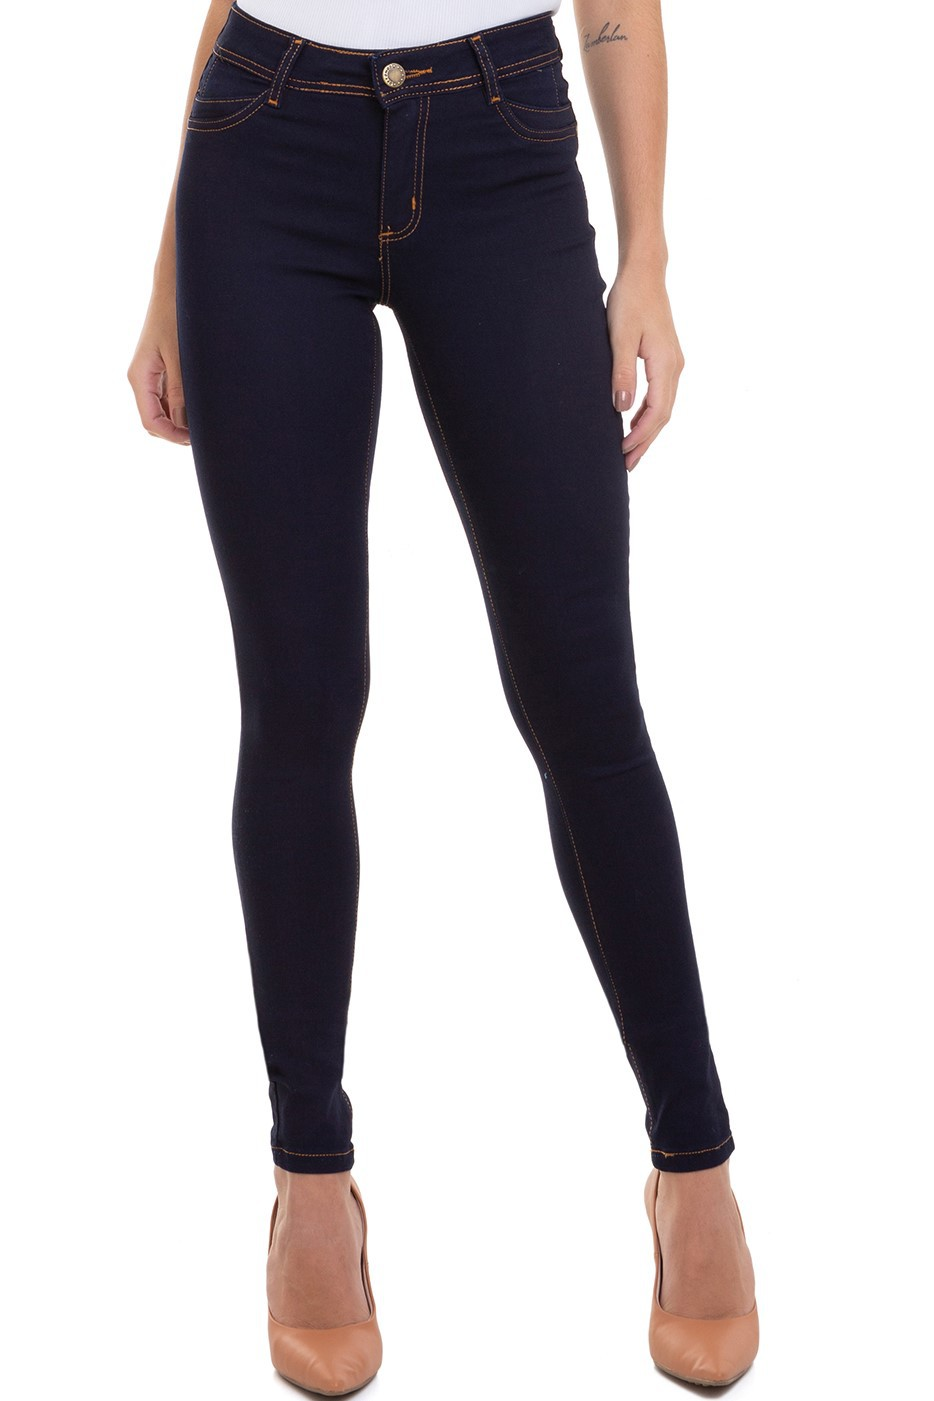 Calça Jeans Feminina Skinny Levanta Bumbum Conexão